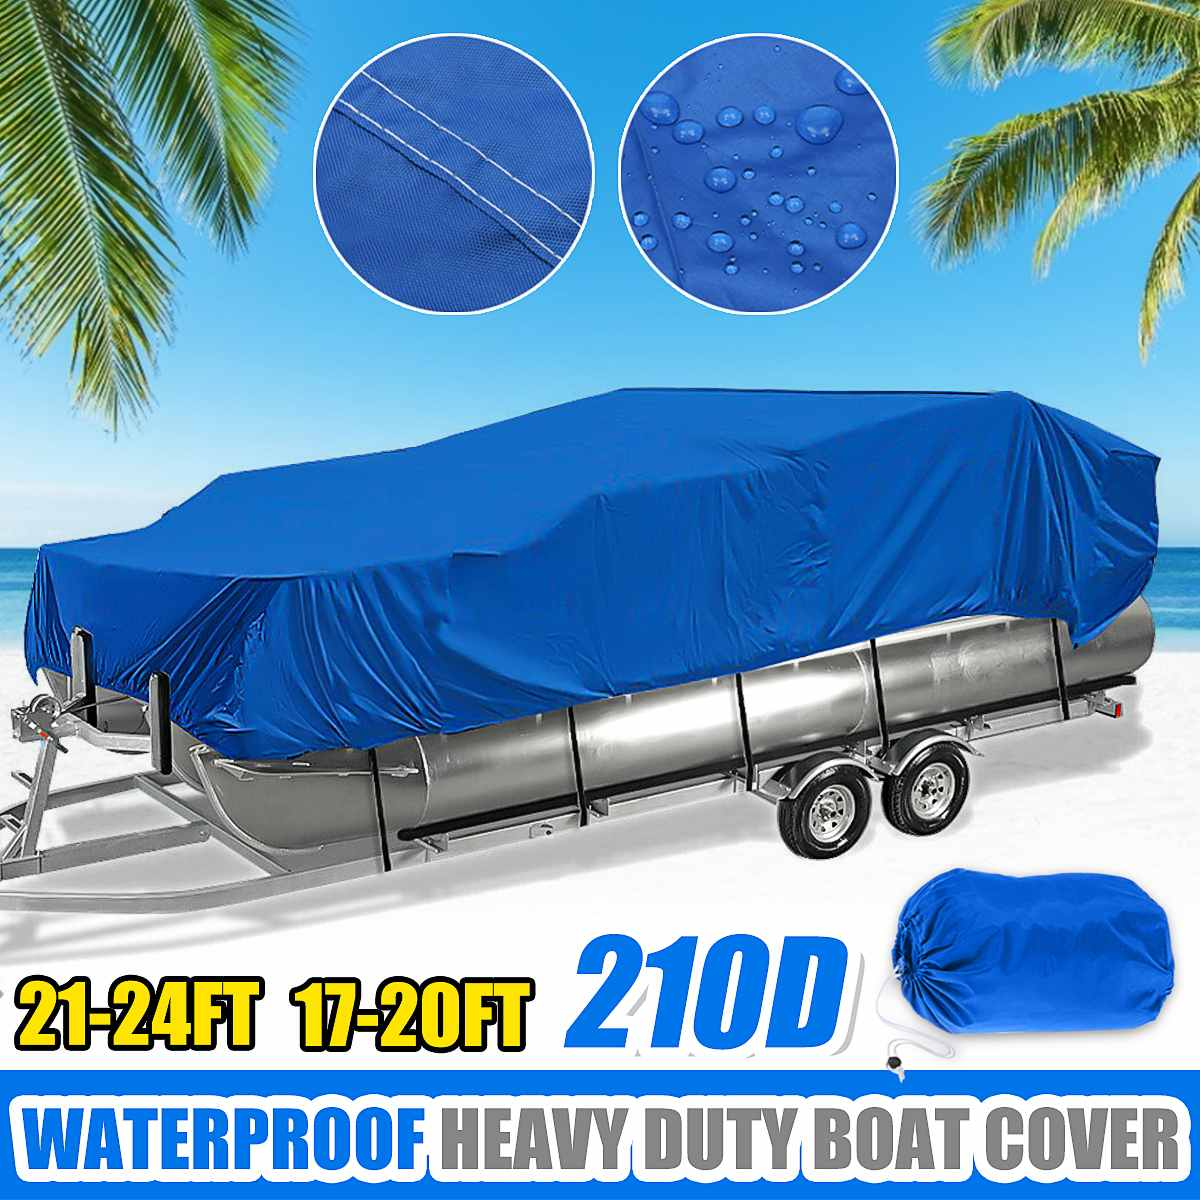 17-20Ft 21-24Ft Heavy Duty 210D Waterproof Pontoon Boat Cover Fish Ski Beam